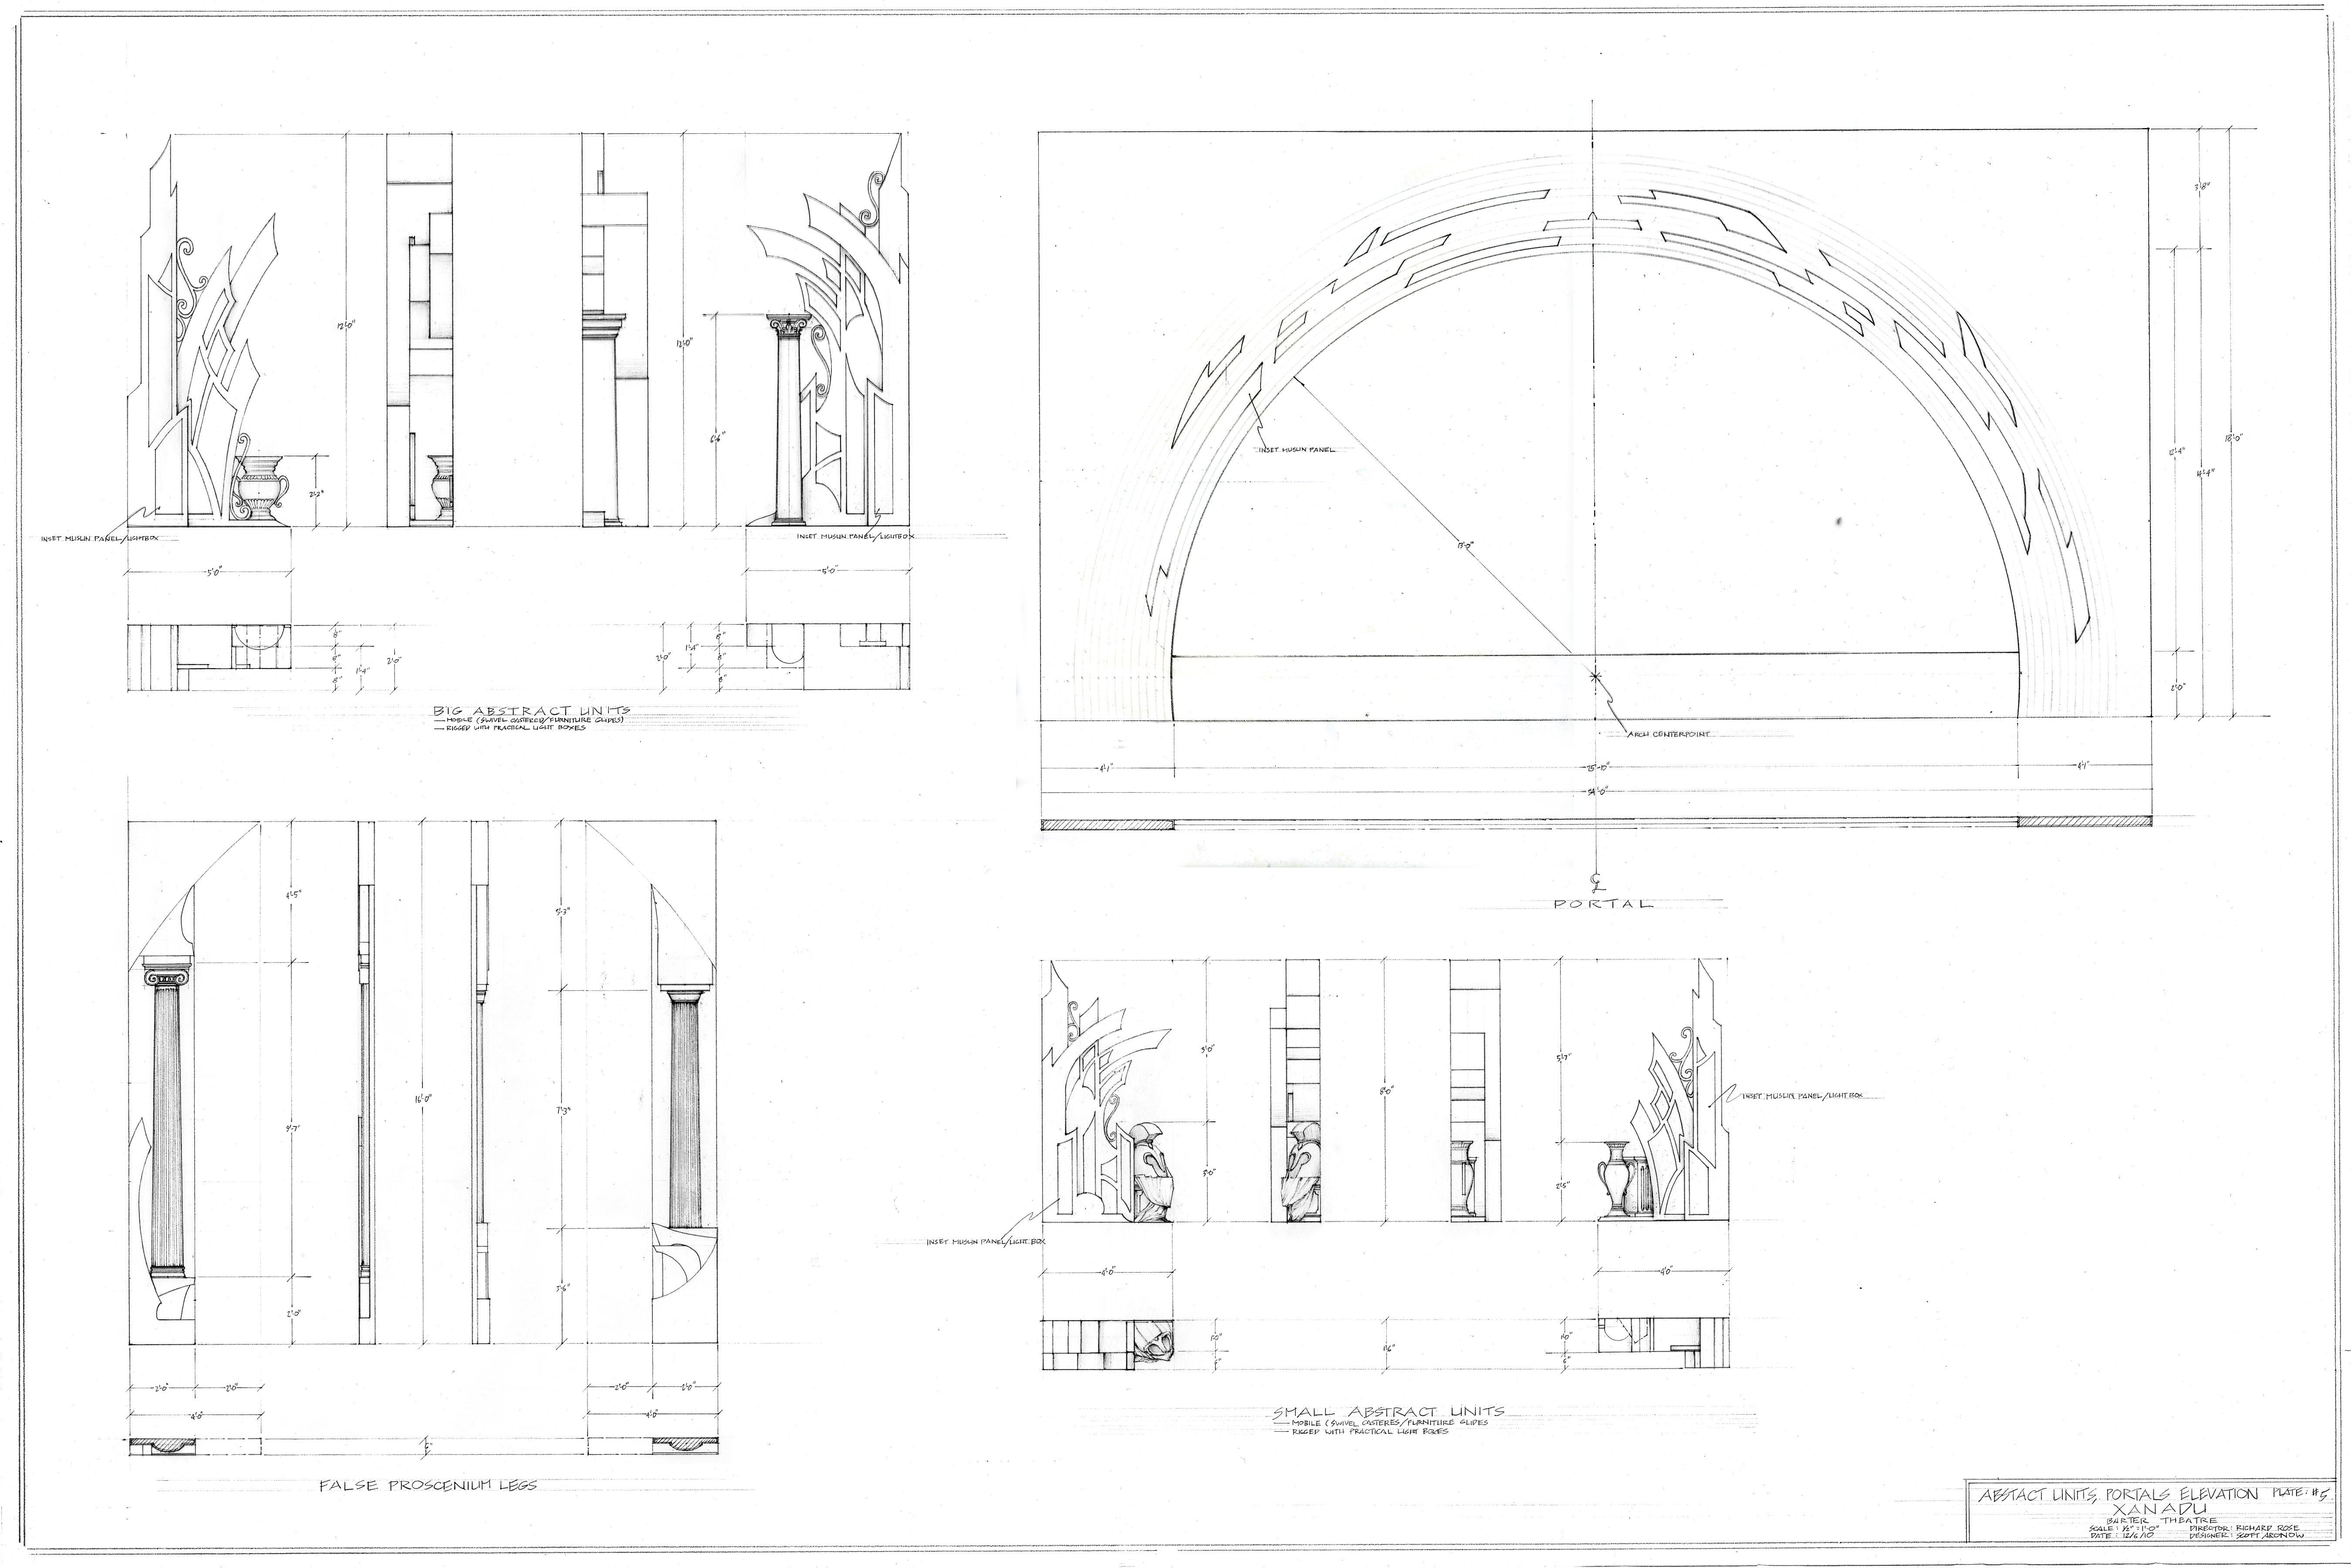 Plate #5-Abstract Units, Portals Elevations